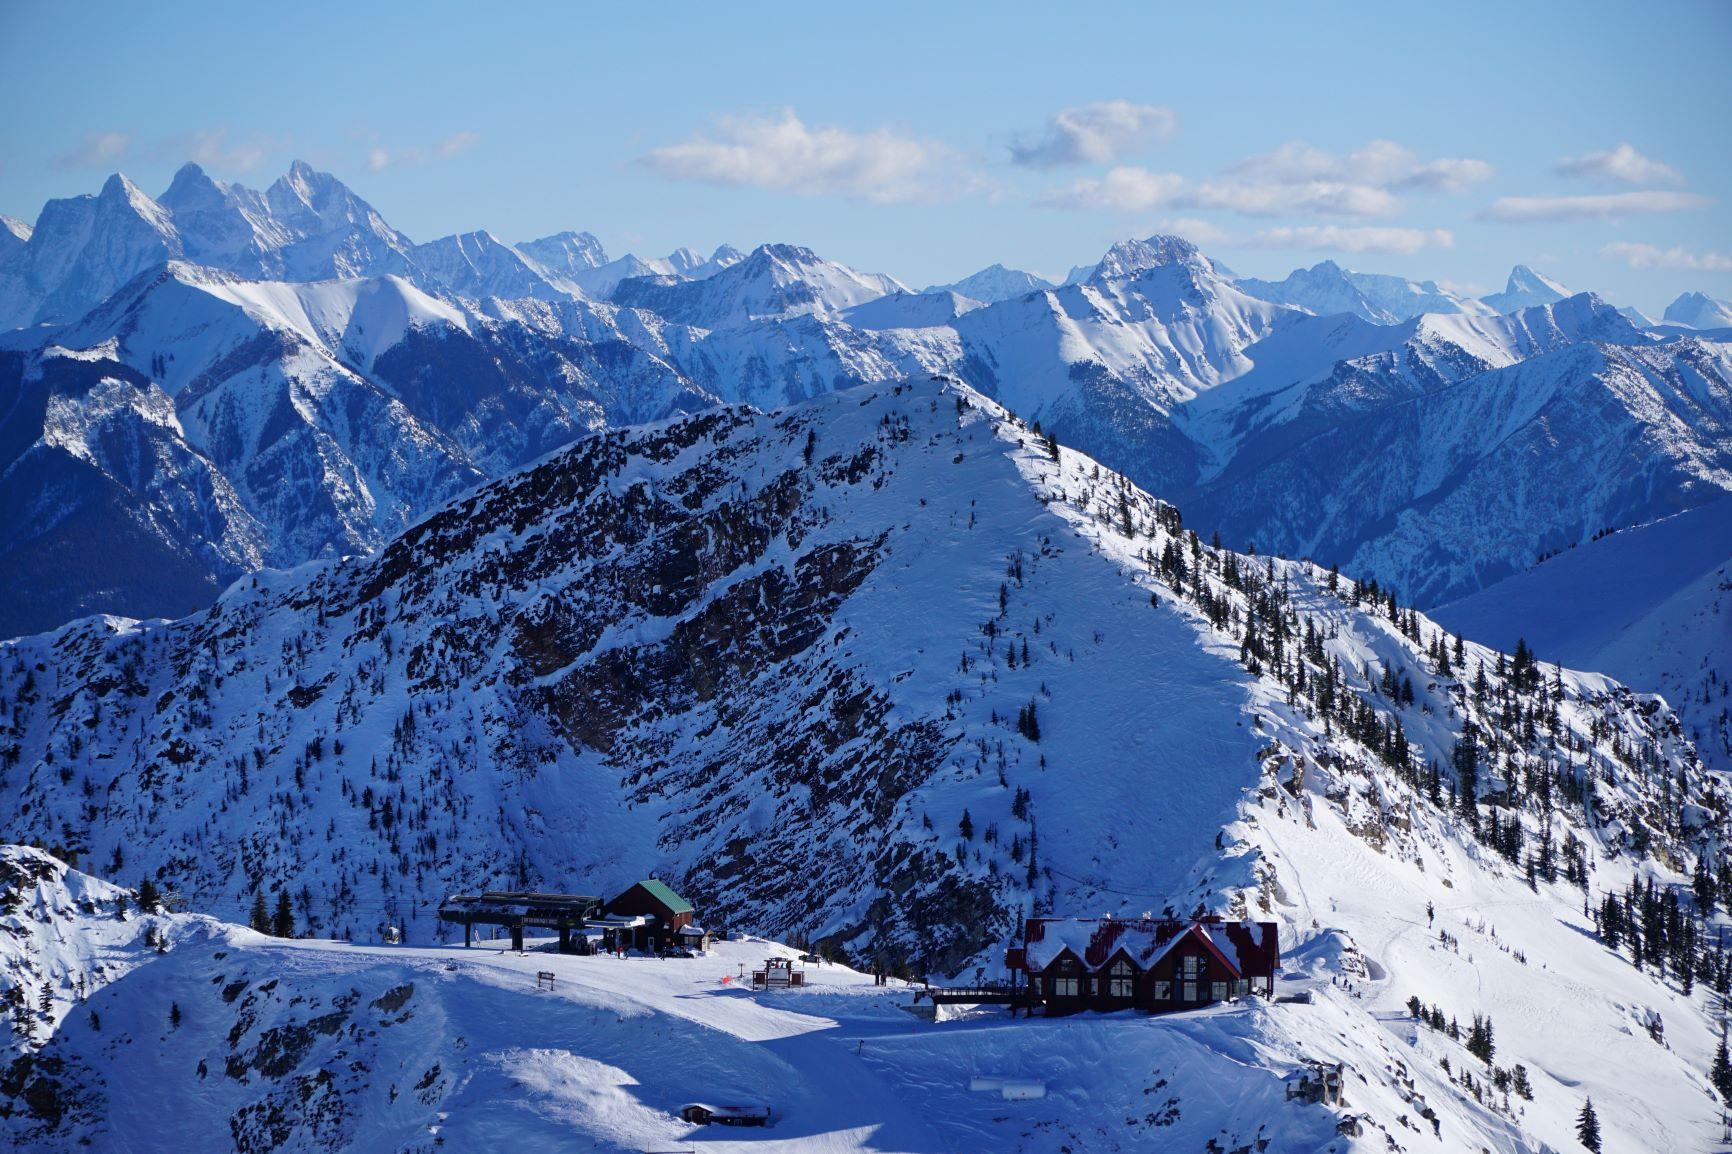 Kicking Horse ski mountain in British Columbia's Kootenay range.